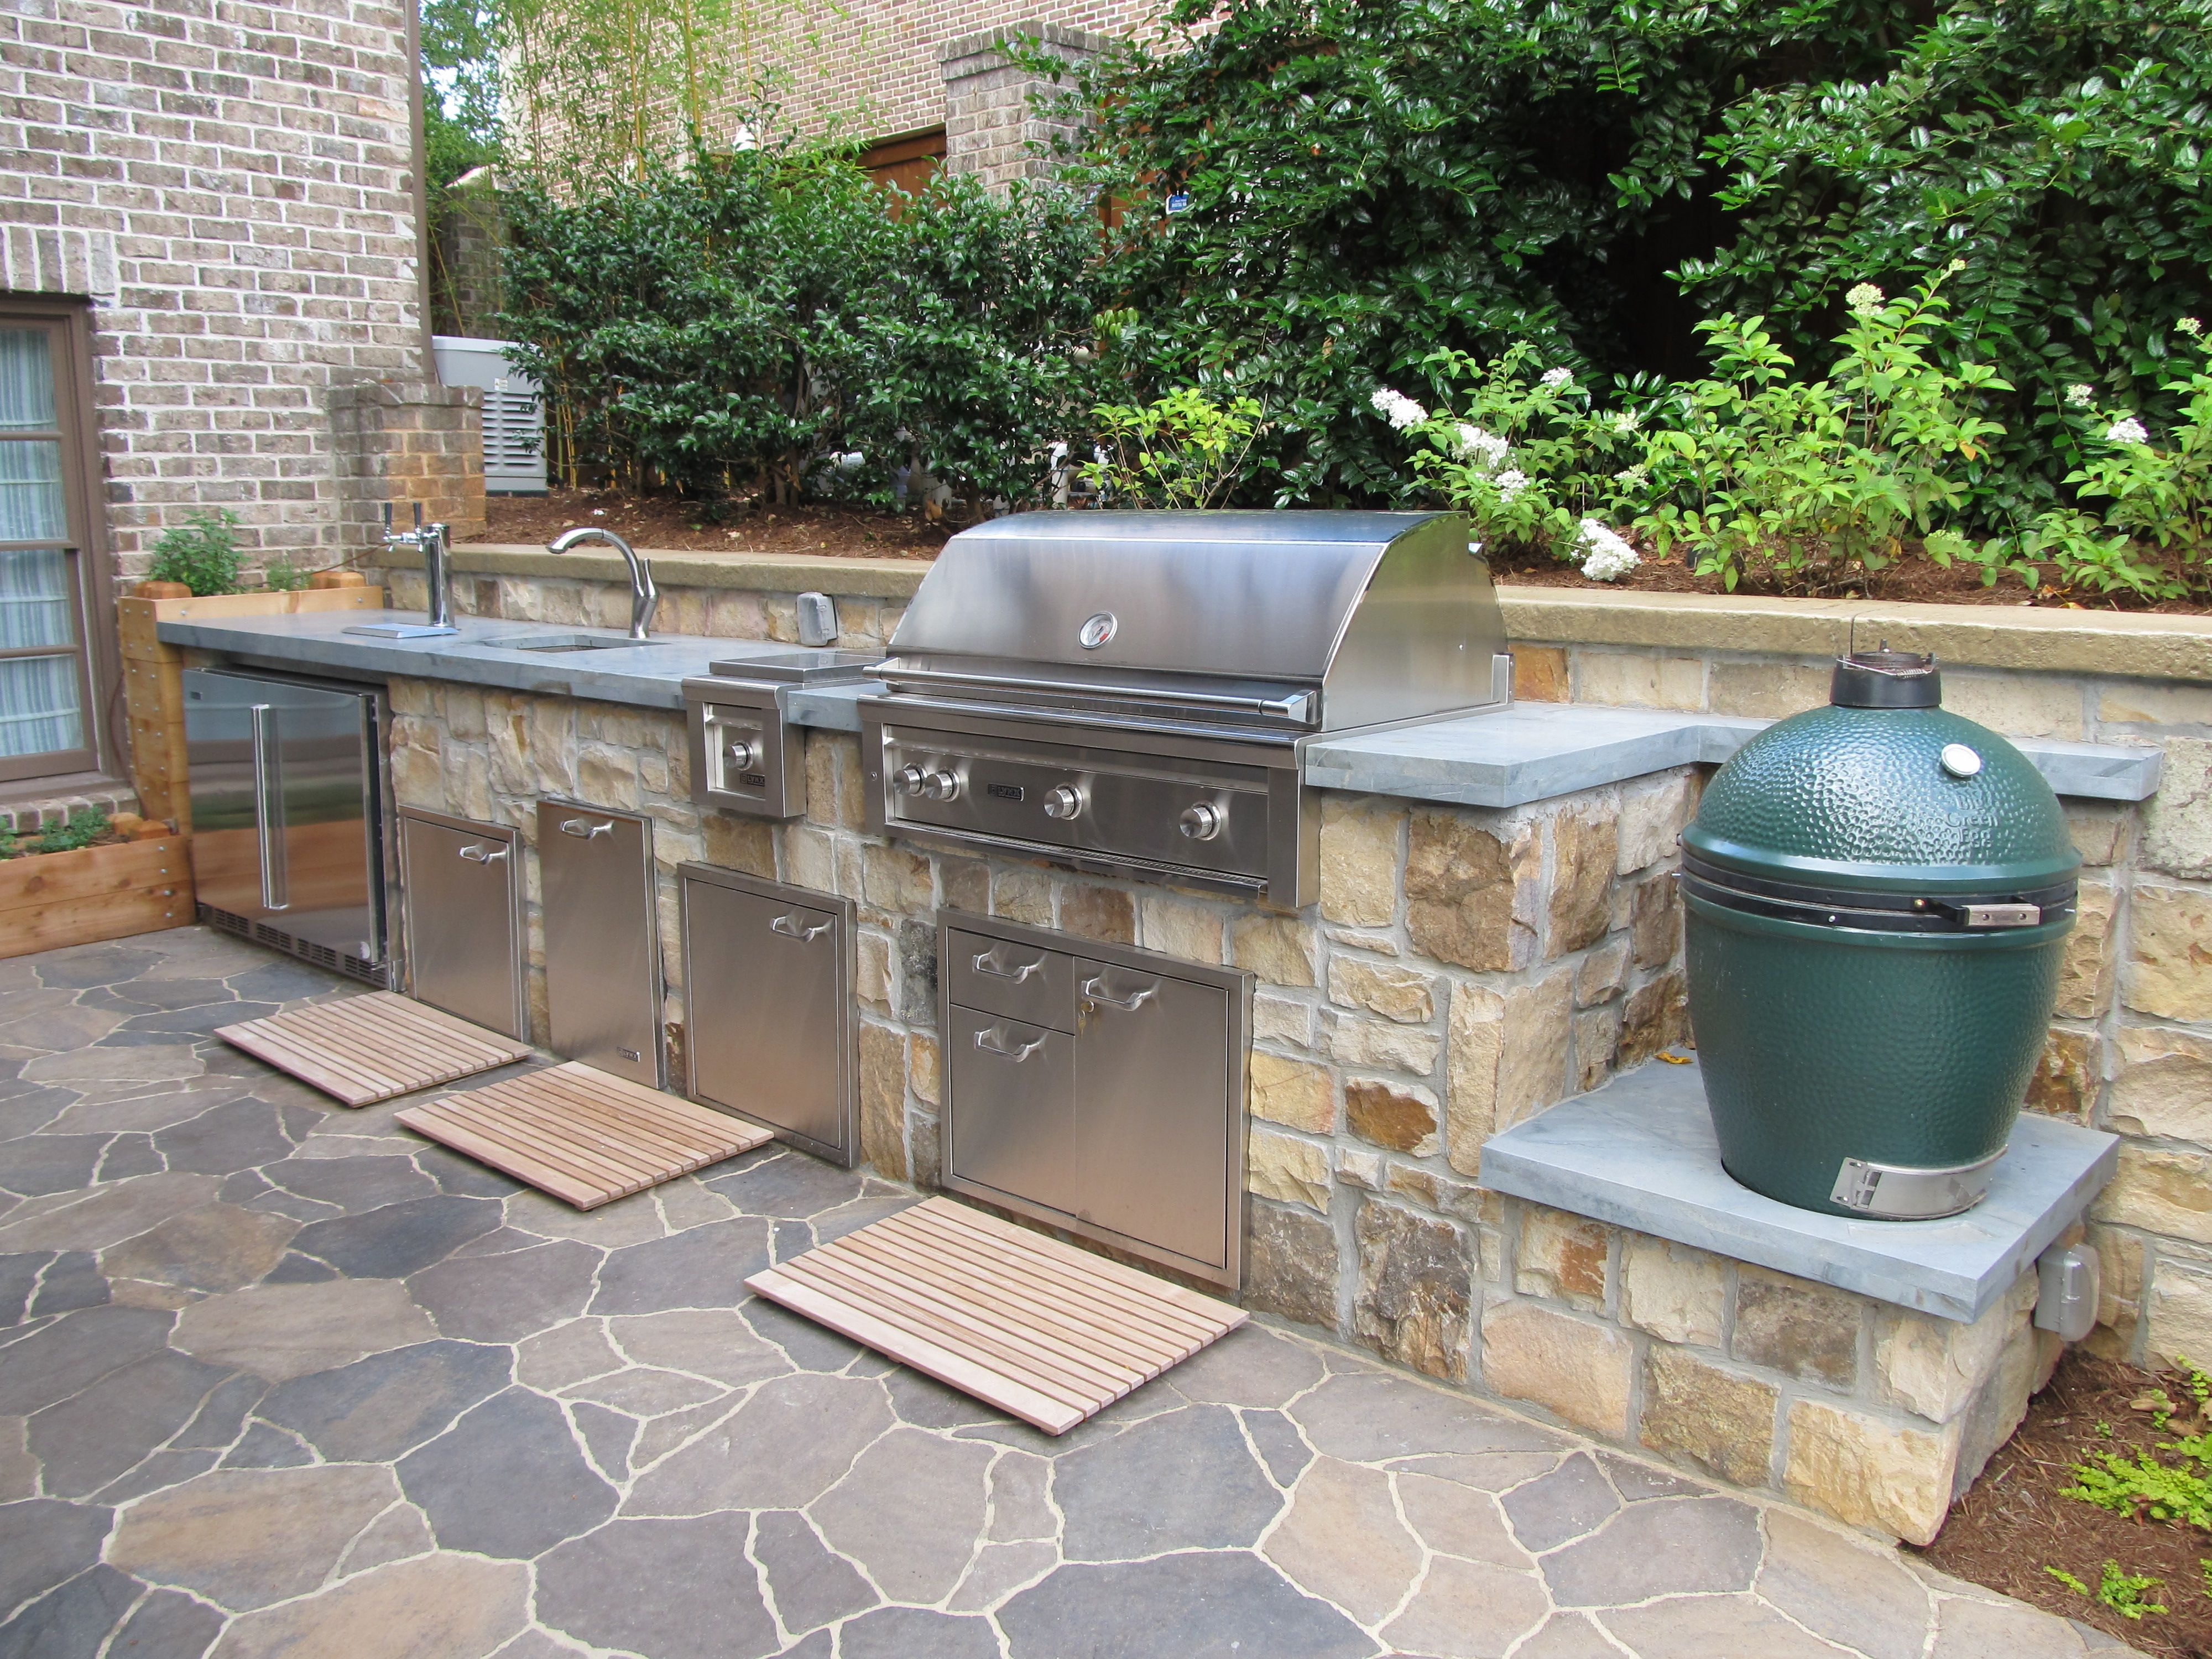 A Custom Made Outdoor Kitchen An Ashlar Fieldstone Veneer Granite Countertop A Lynx Grill And Applian Outdoor Kitchen Design Outdoor Kitchen Backyard Kitchen